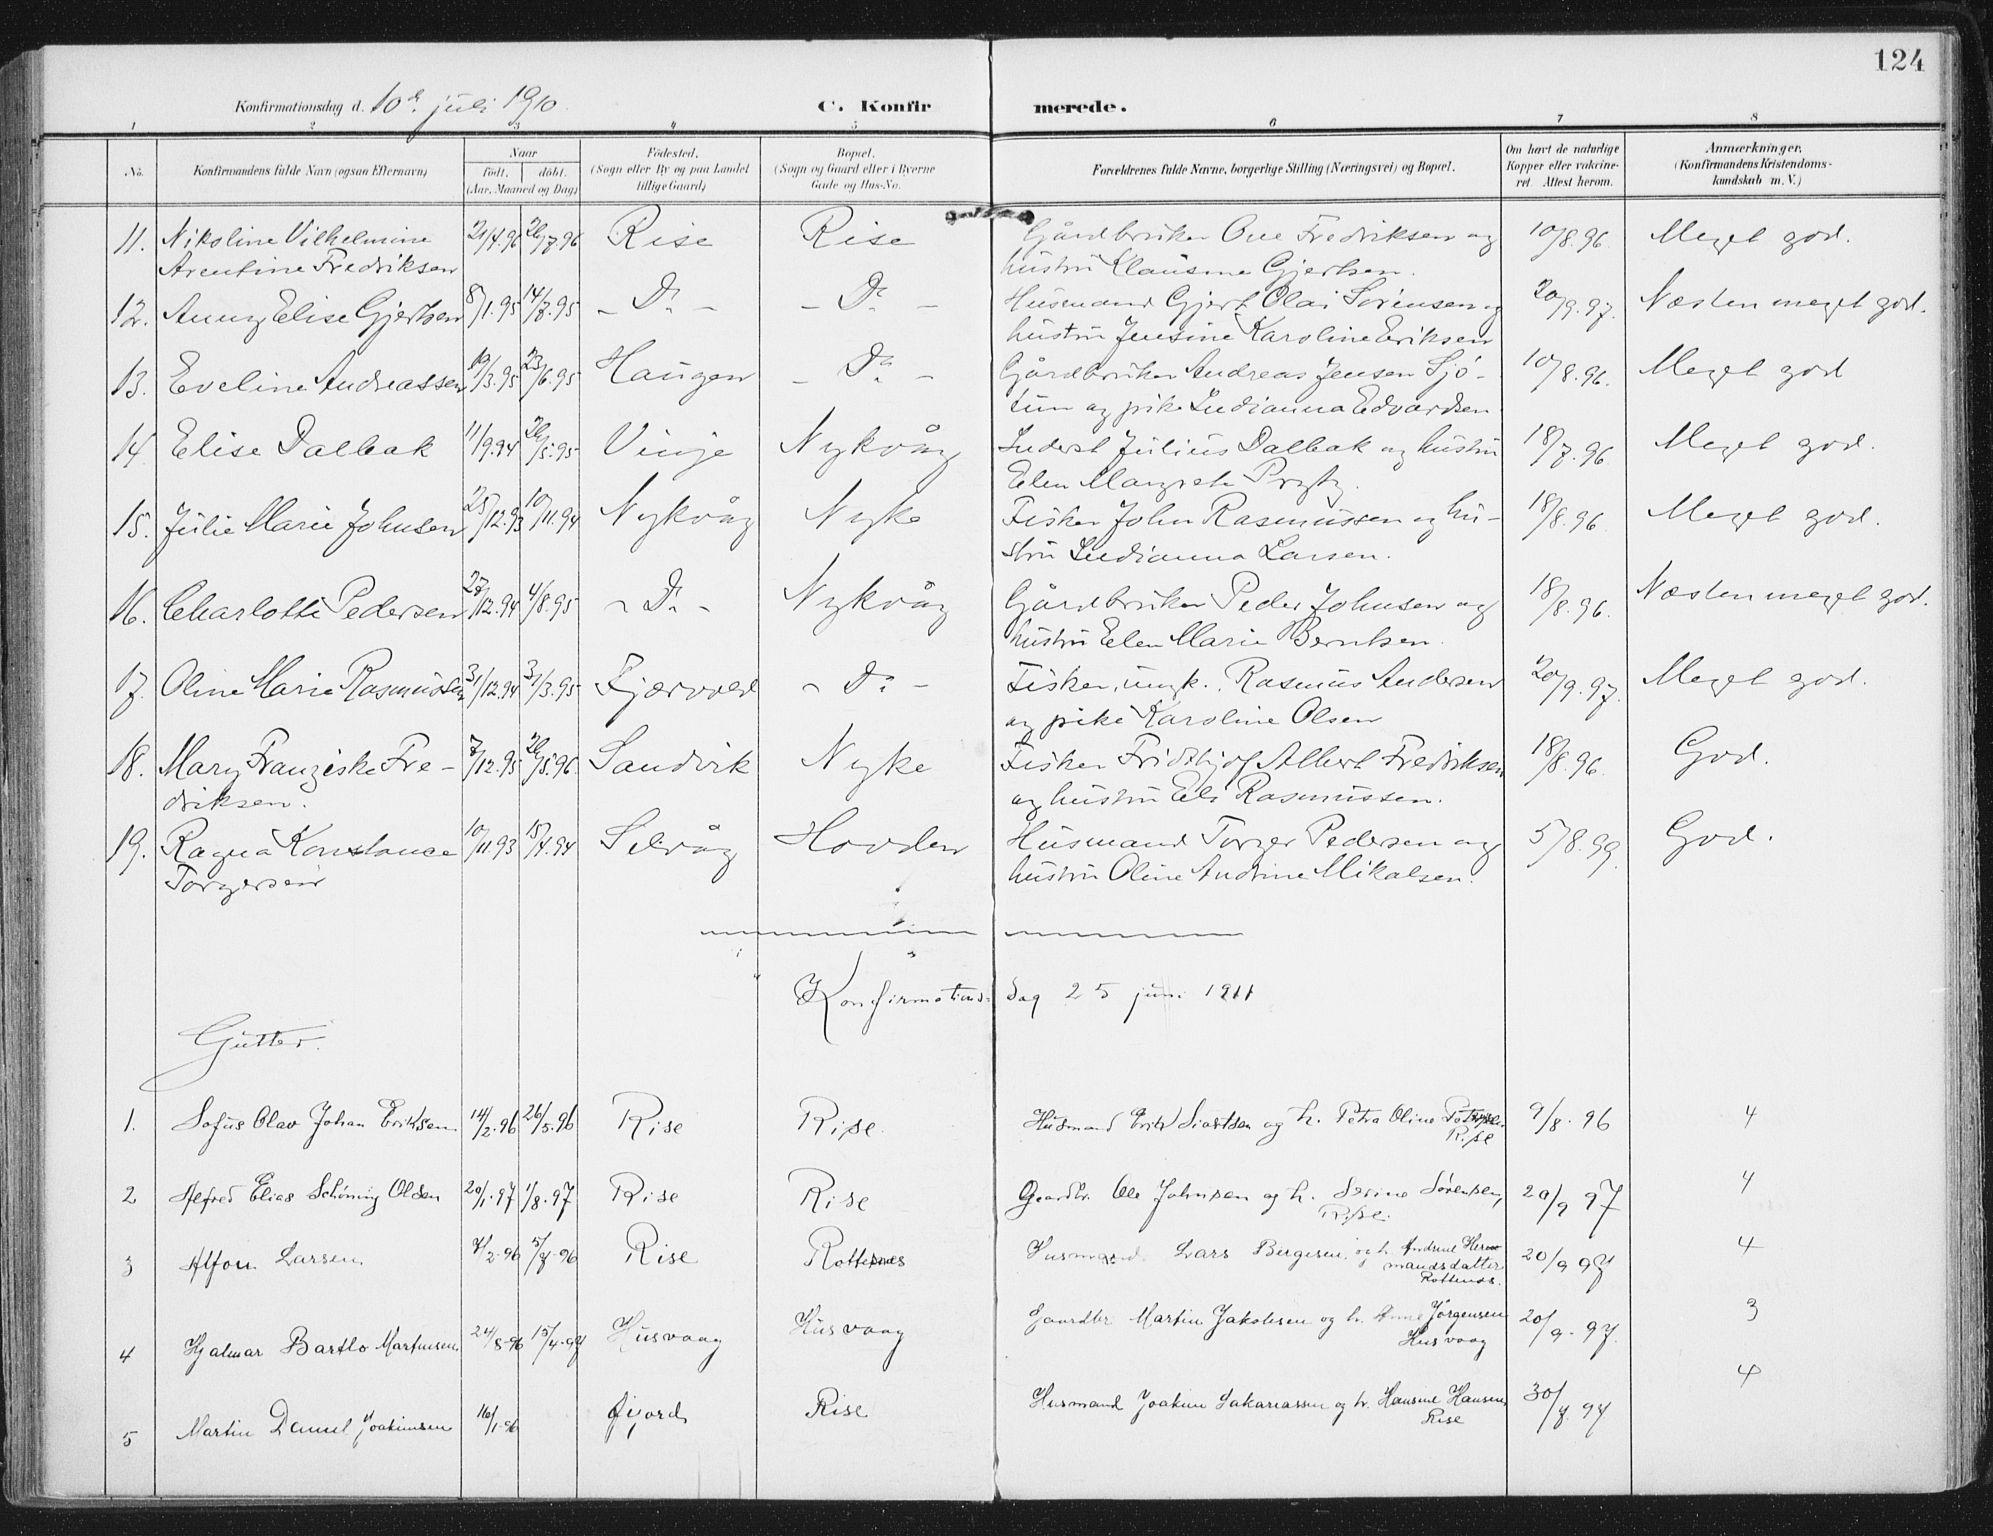 SAT, Ministerialprotokoller, klokkerbøker og fødselsregistre - Nordland, 892/L1321: Ministerialbok nr. 892A02, 1902-1918, s. 124